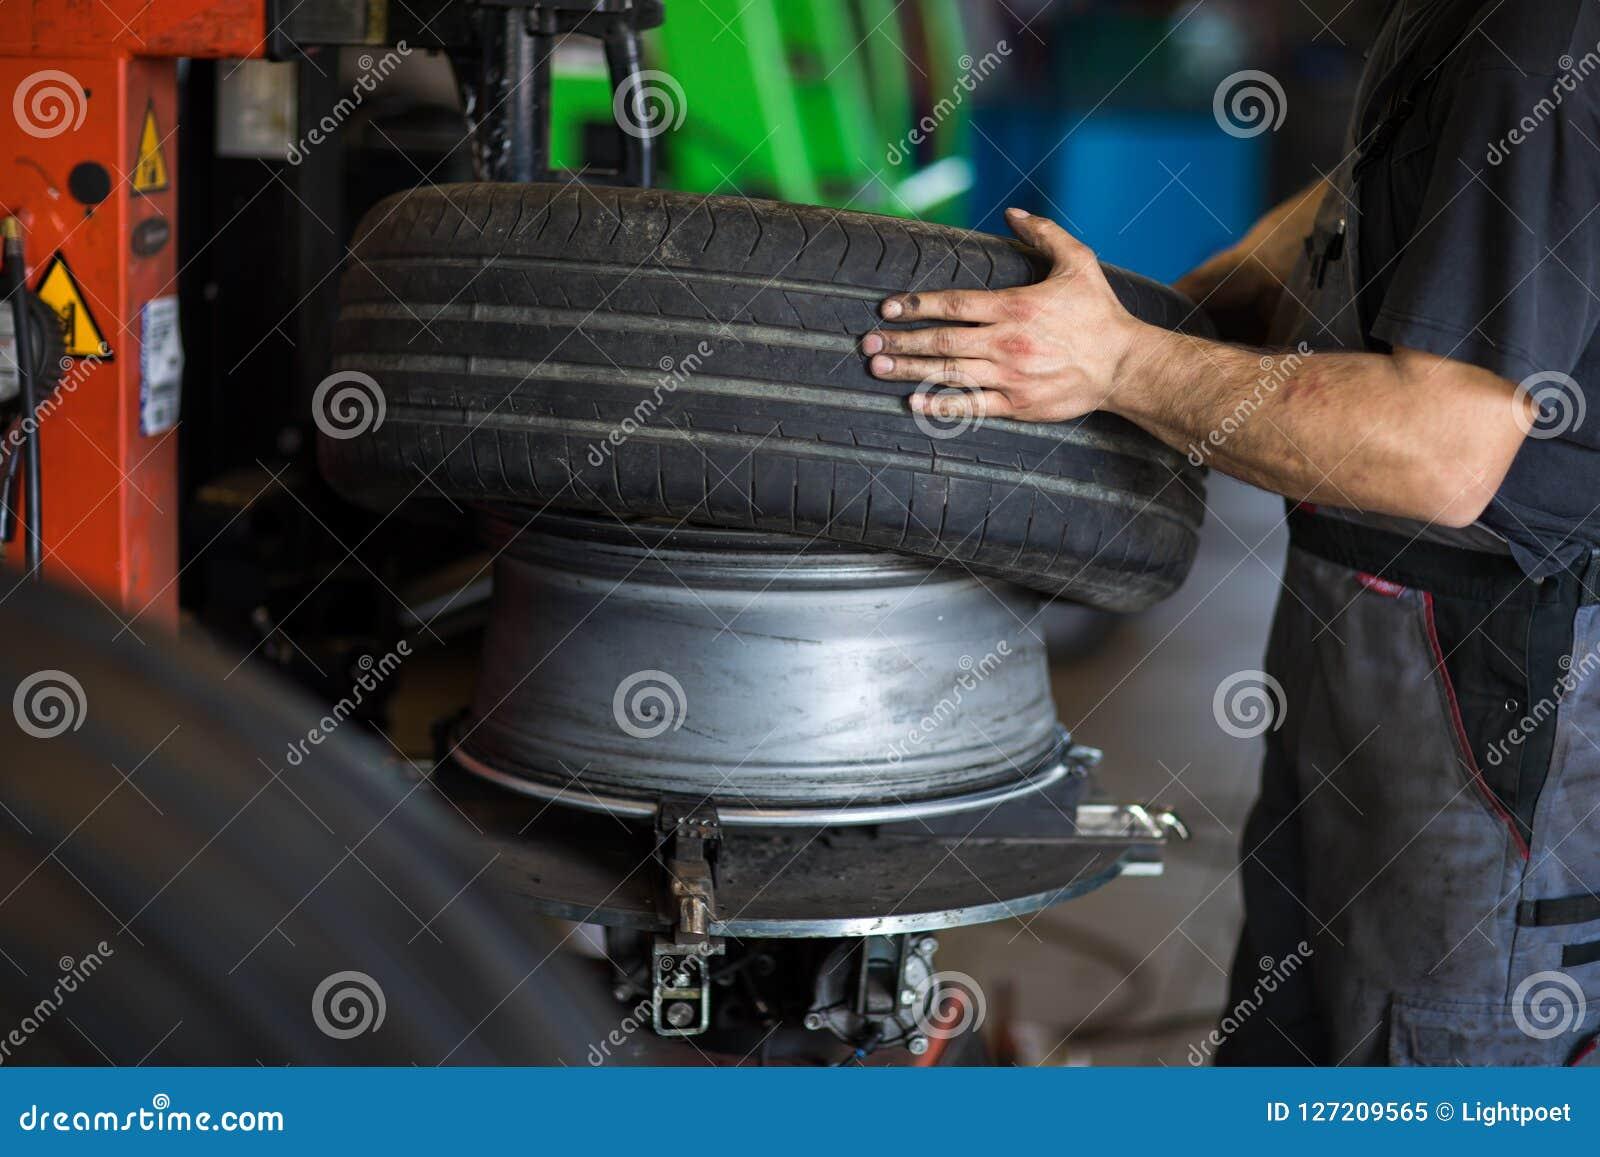 Wheel balancing or repair and change car tire at auto service